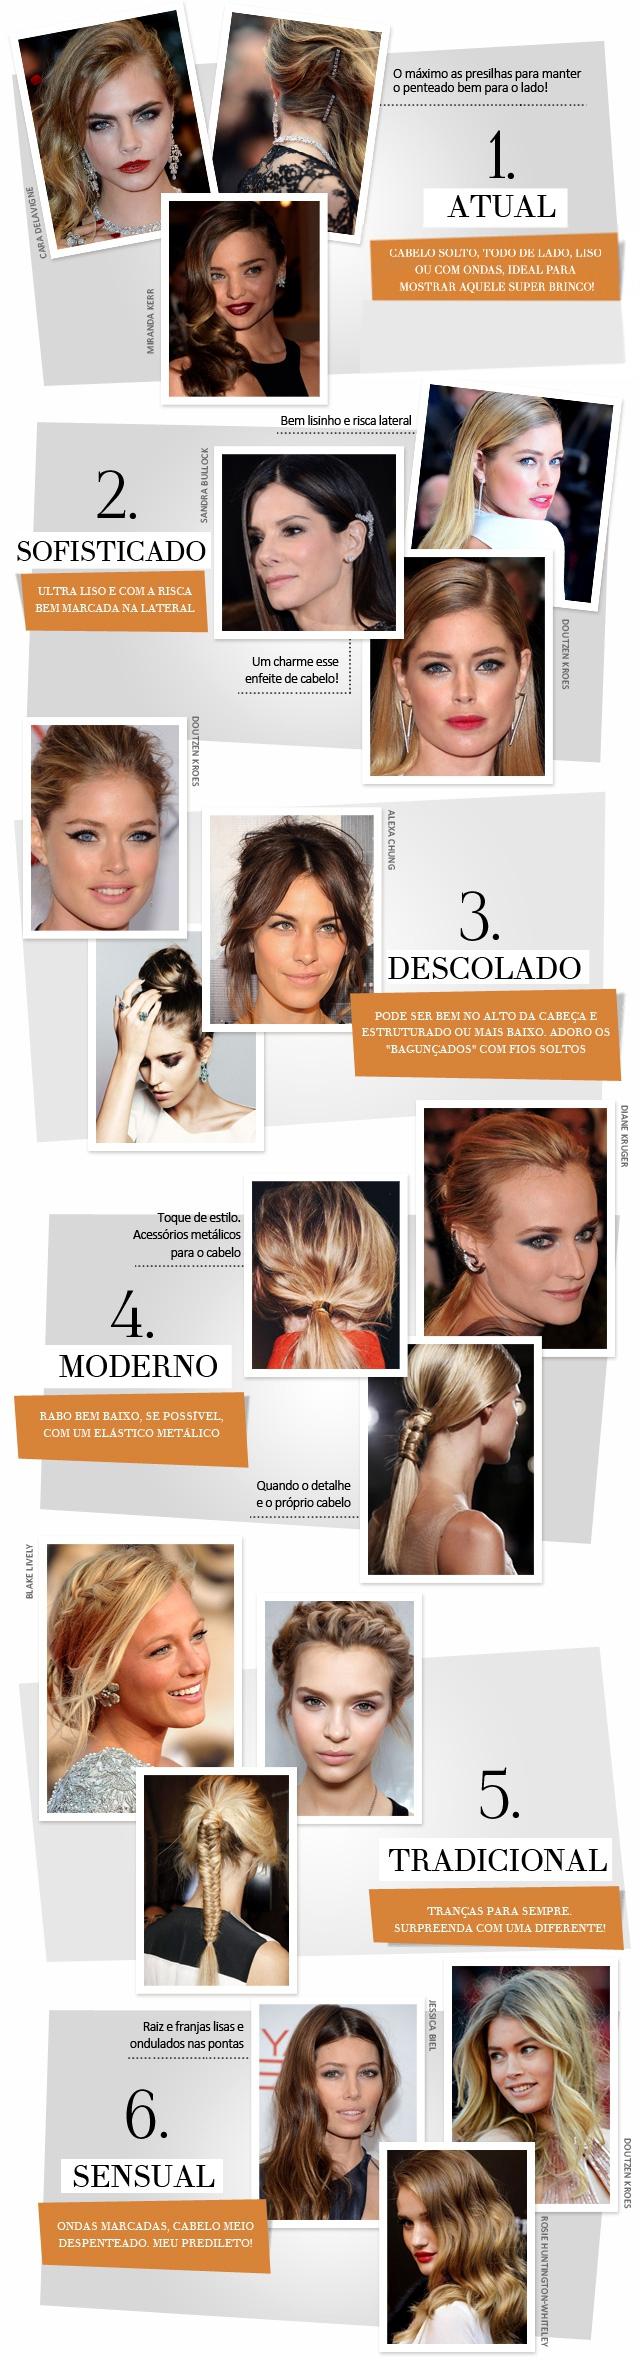 blog-da-alice-ferraz-inspiracao-penteados